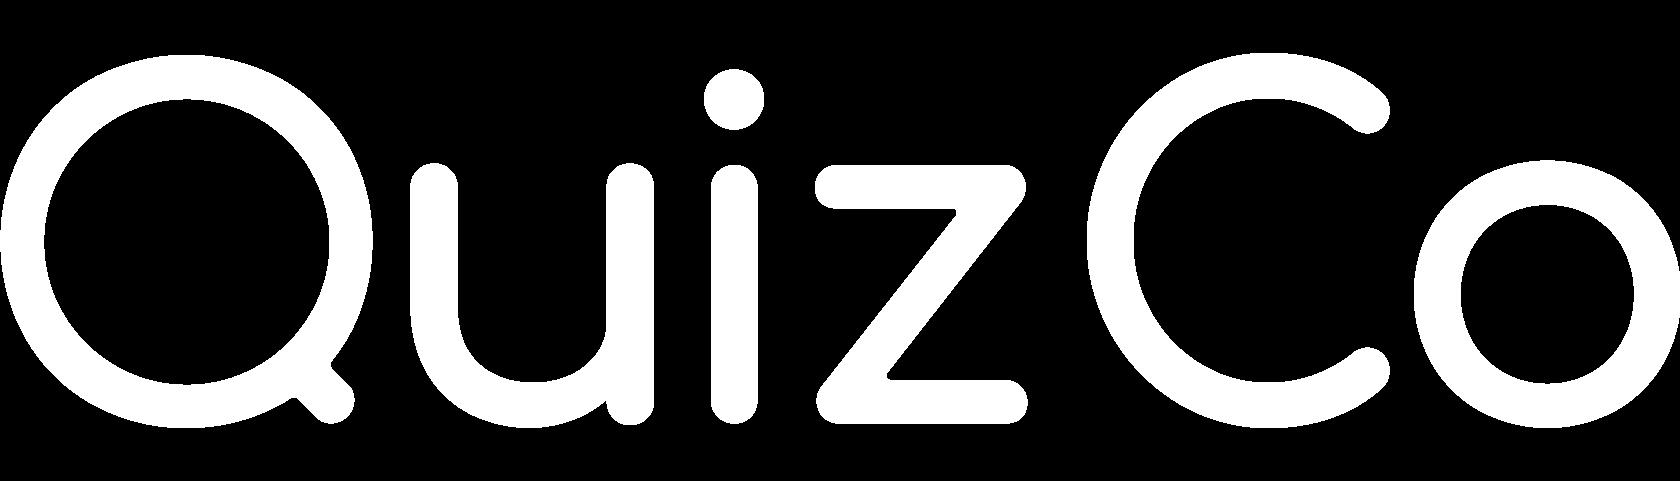 QuizCo Logo weiß